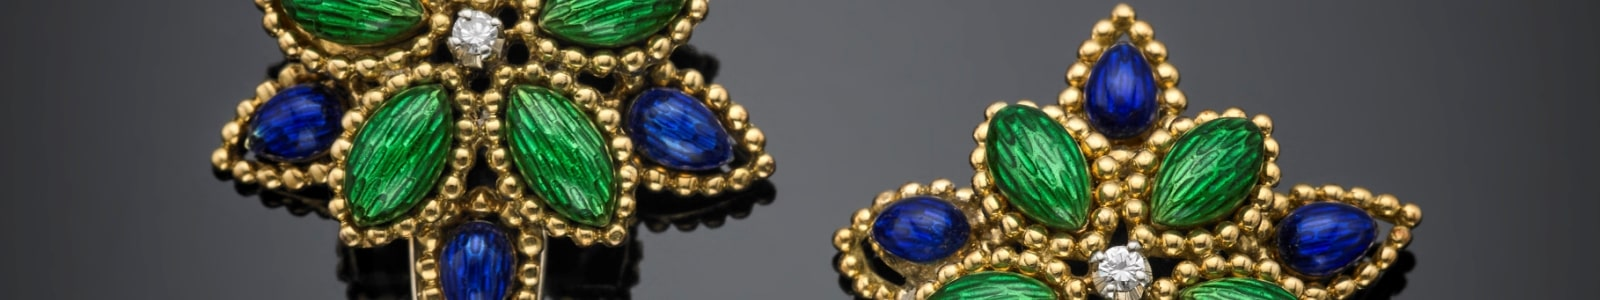 Jewels sale - Session 4